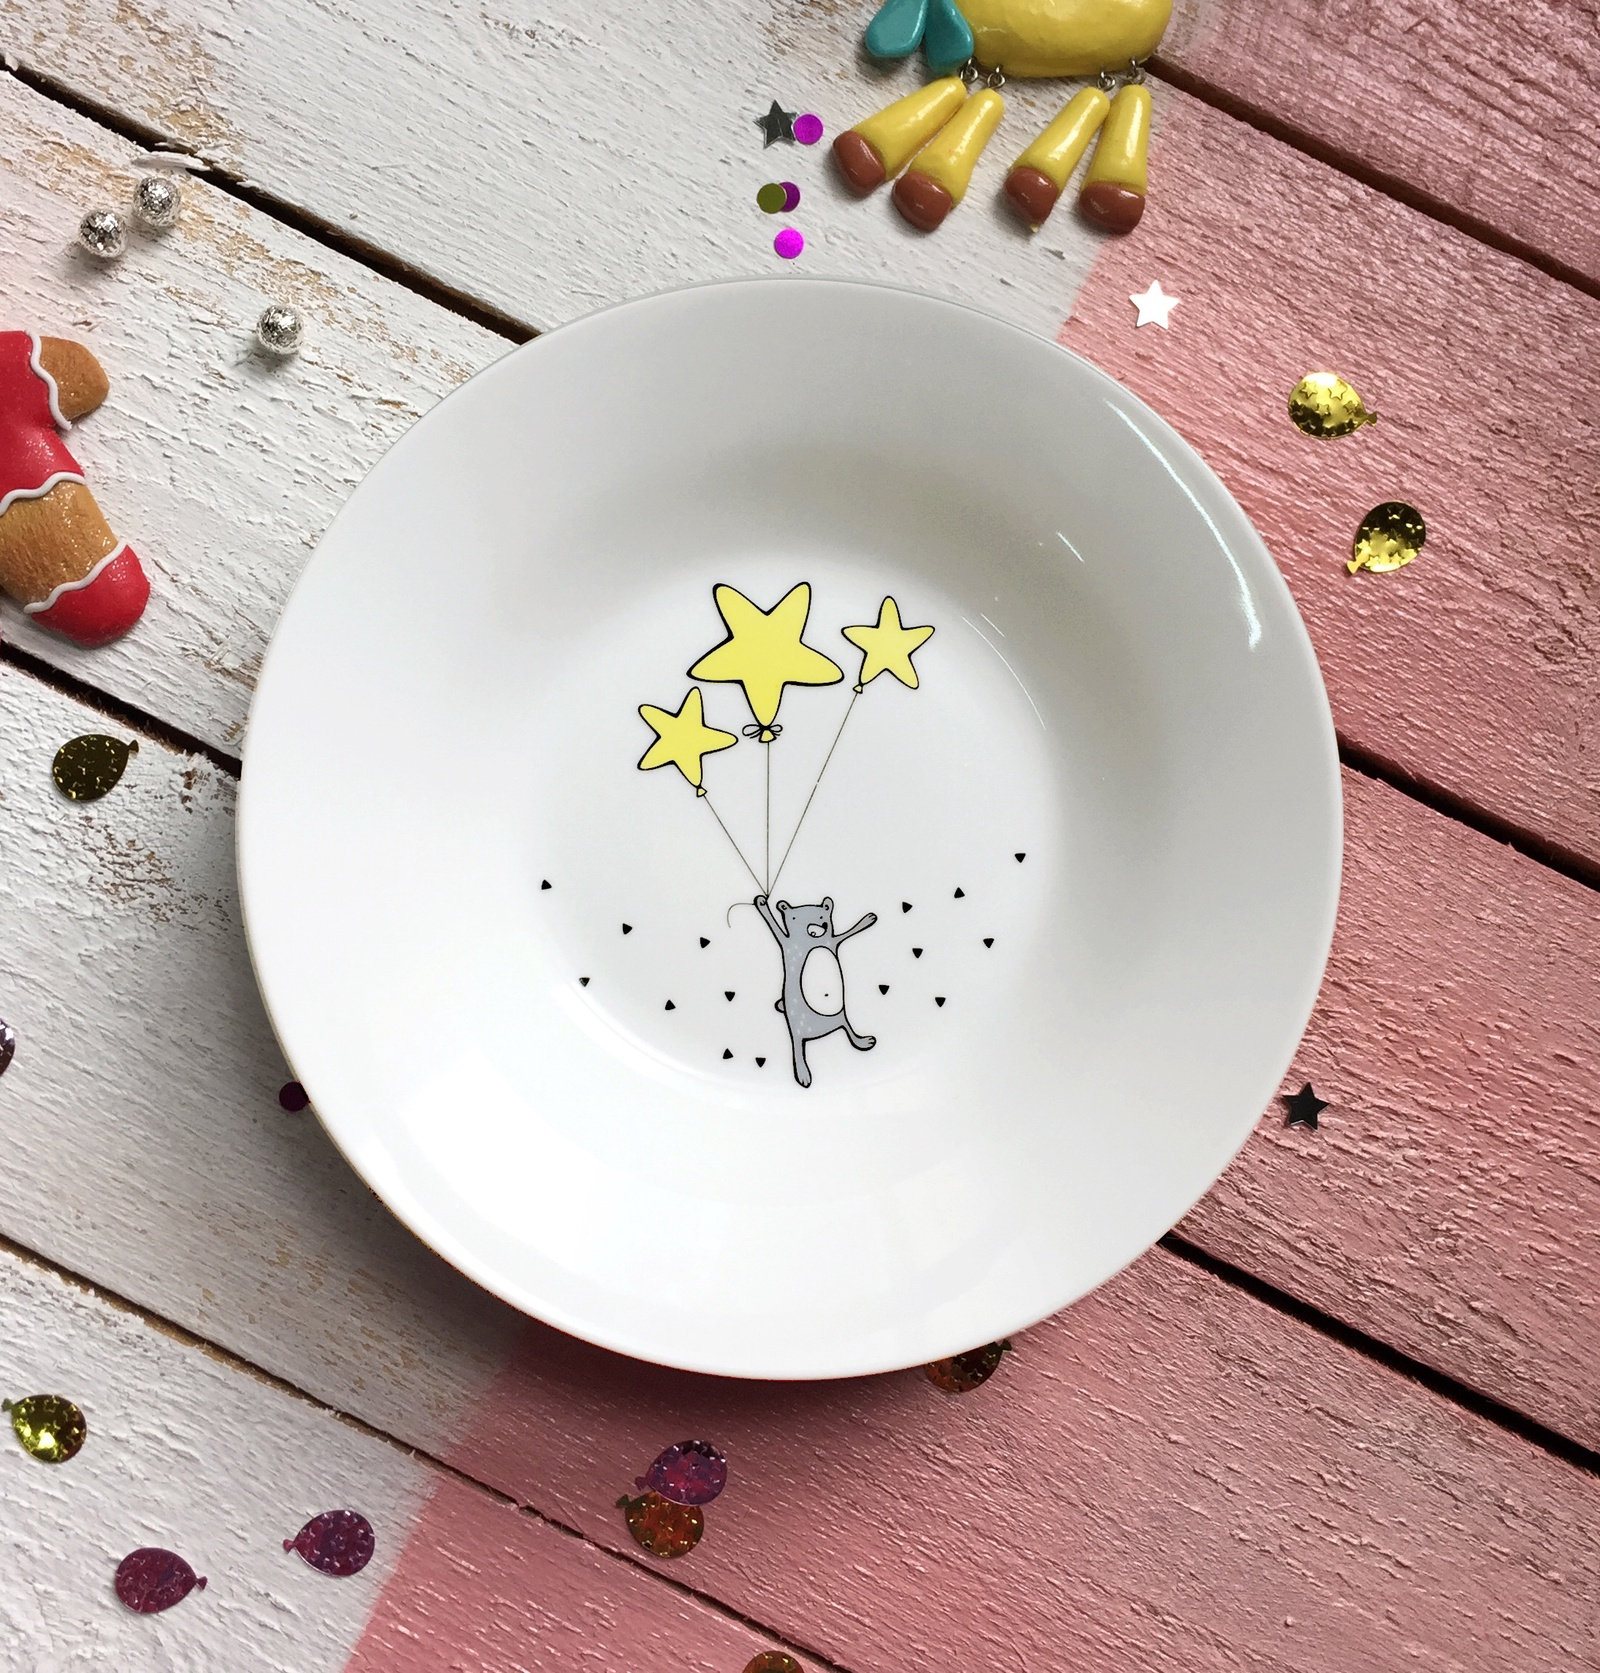 Тарелка глубокая Звёздный мишка 20 см тарелка мелкая сотвори чудо маленький принц faien диаметр 20 см